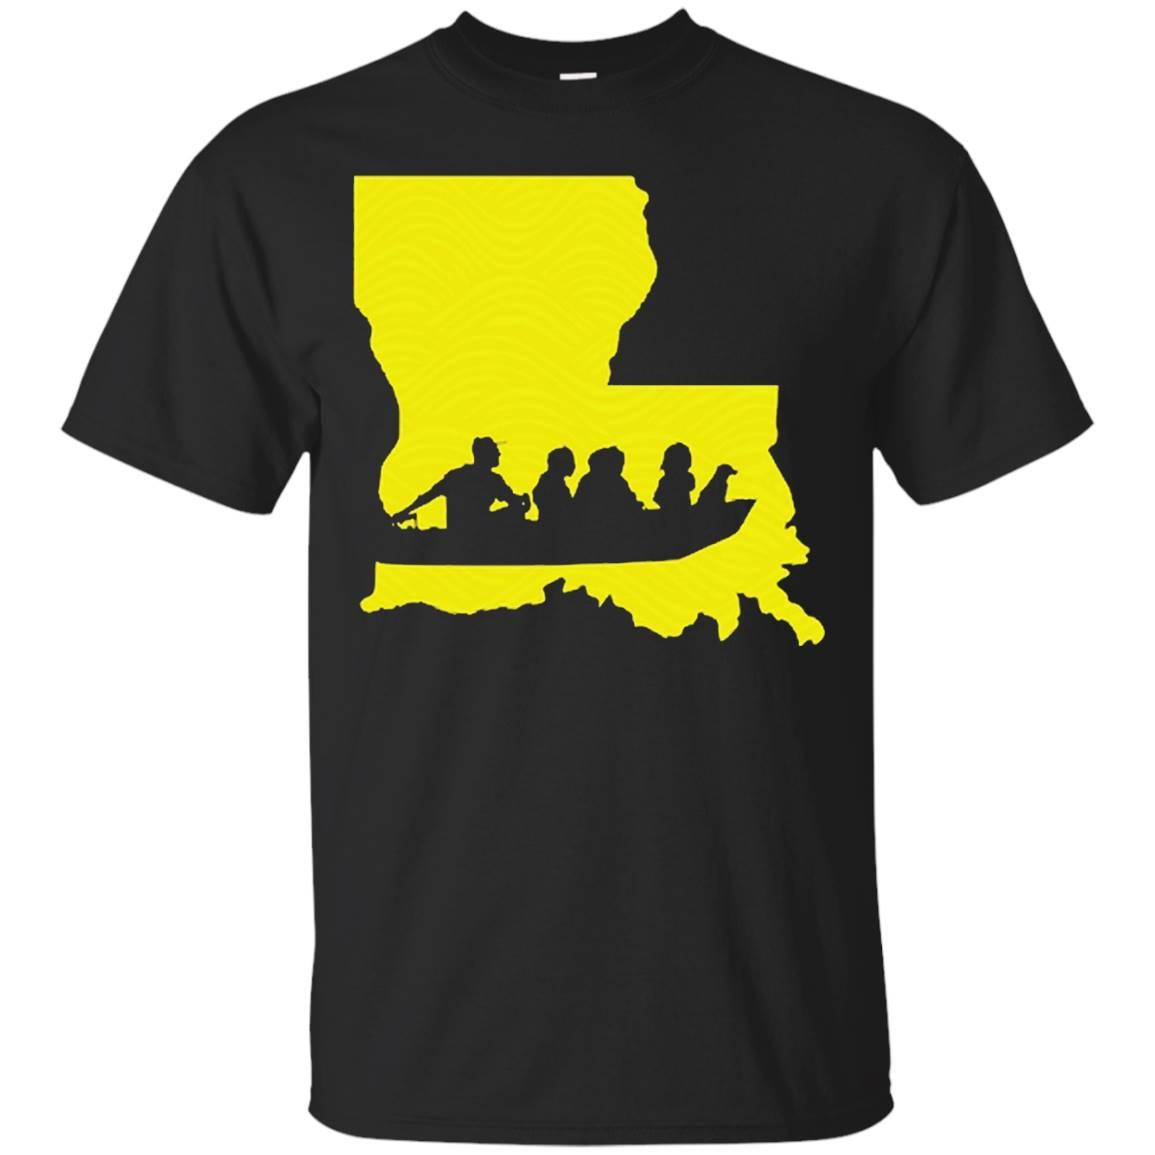 I support Louisiana Search and Rescue Shirt, Louisiana flood